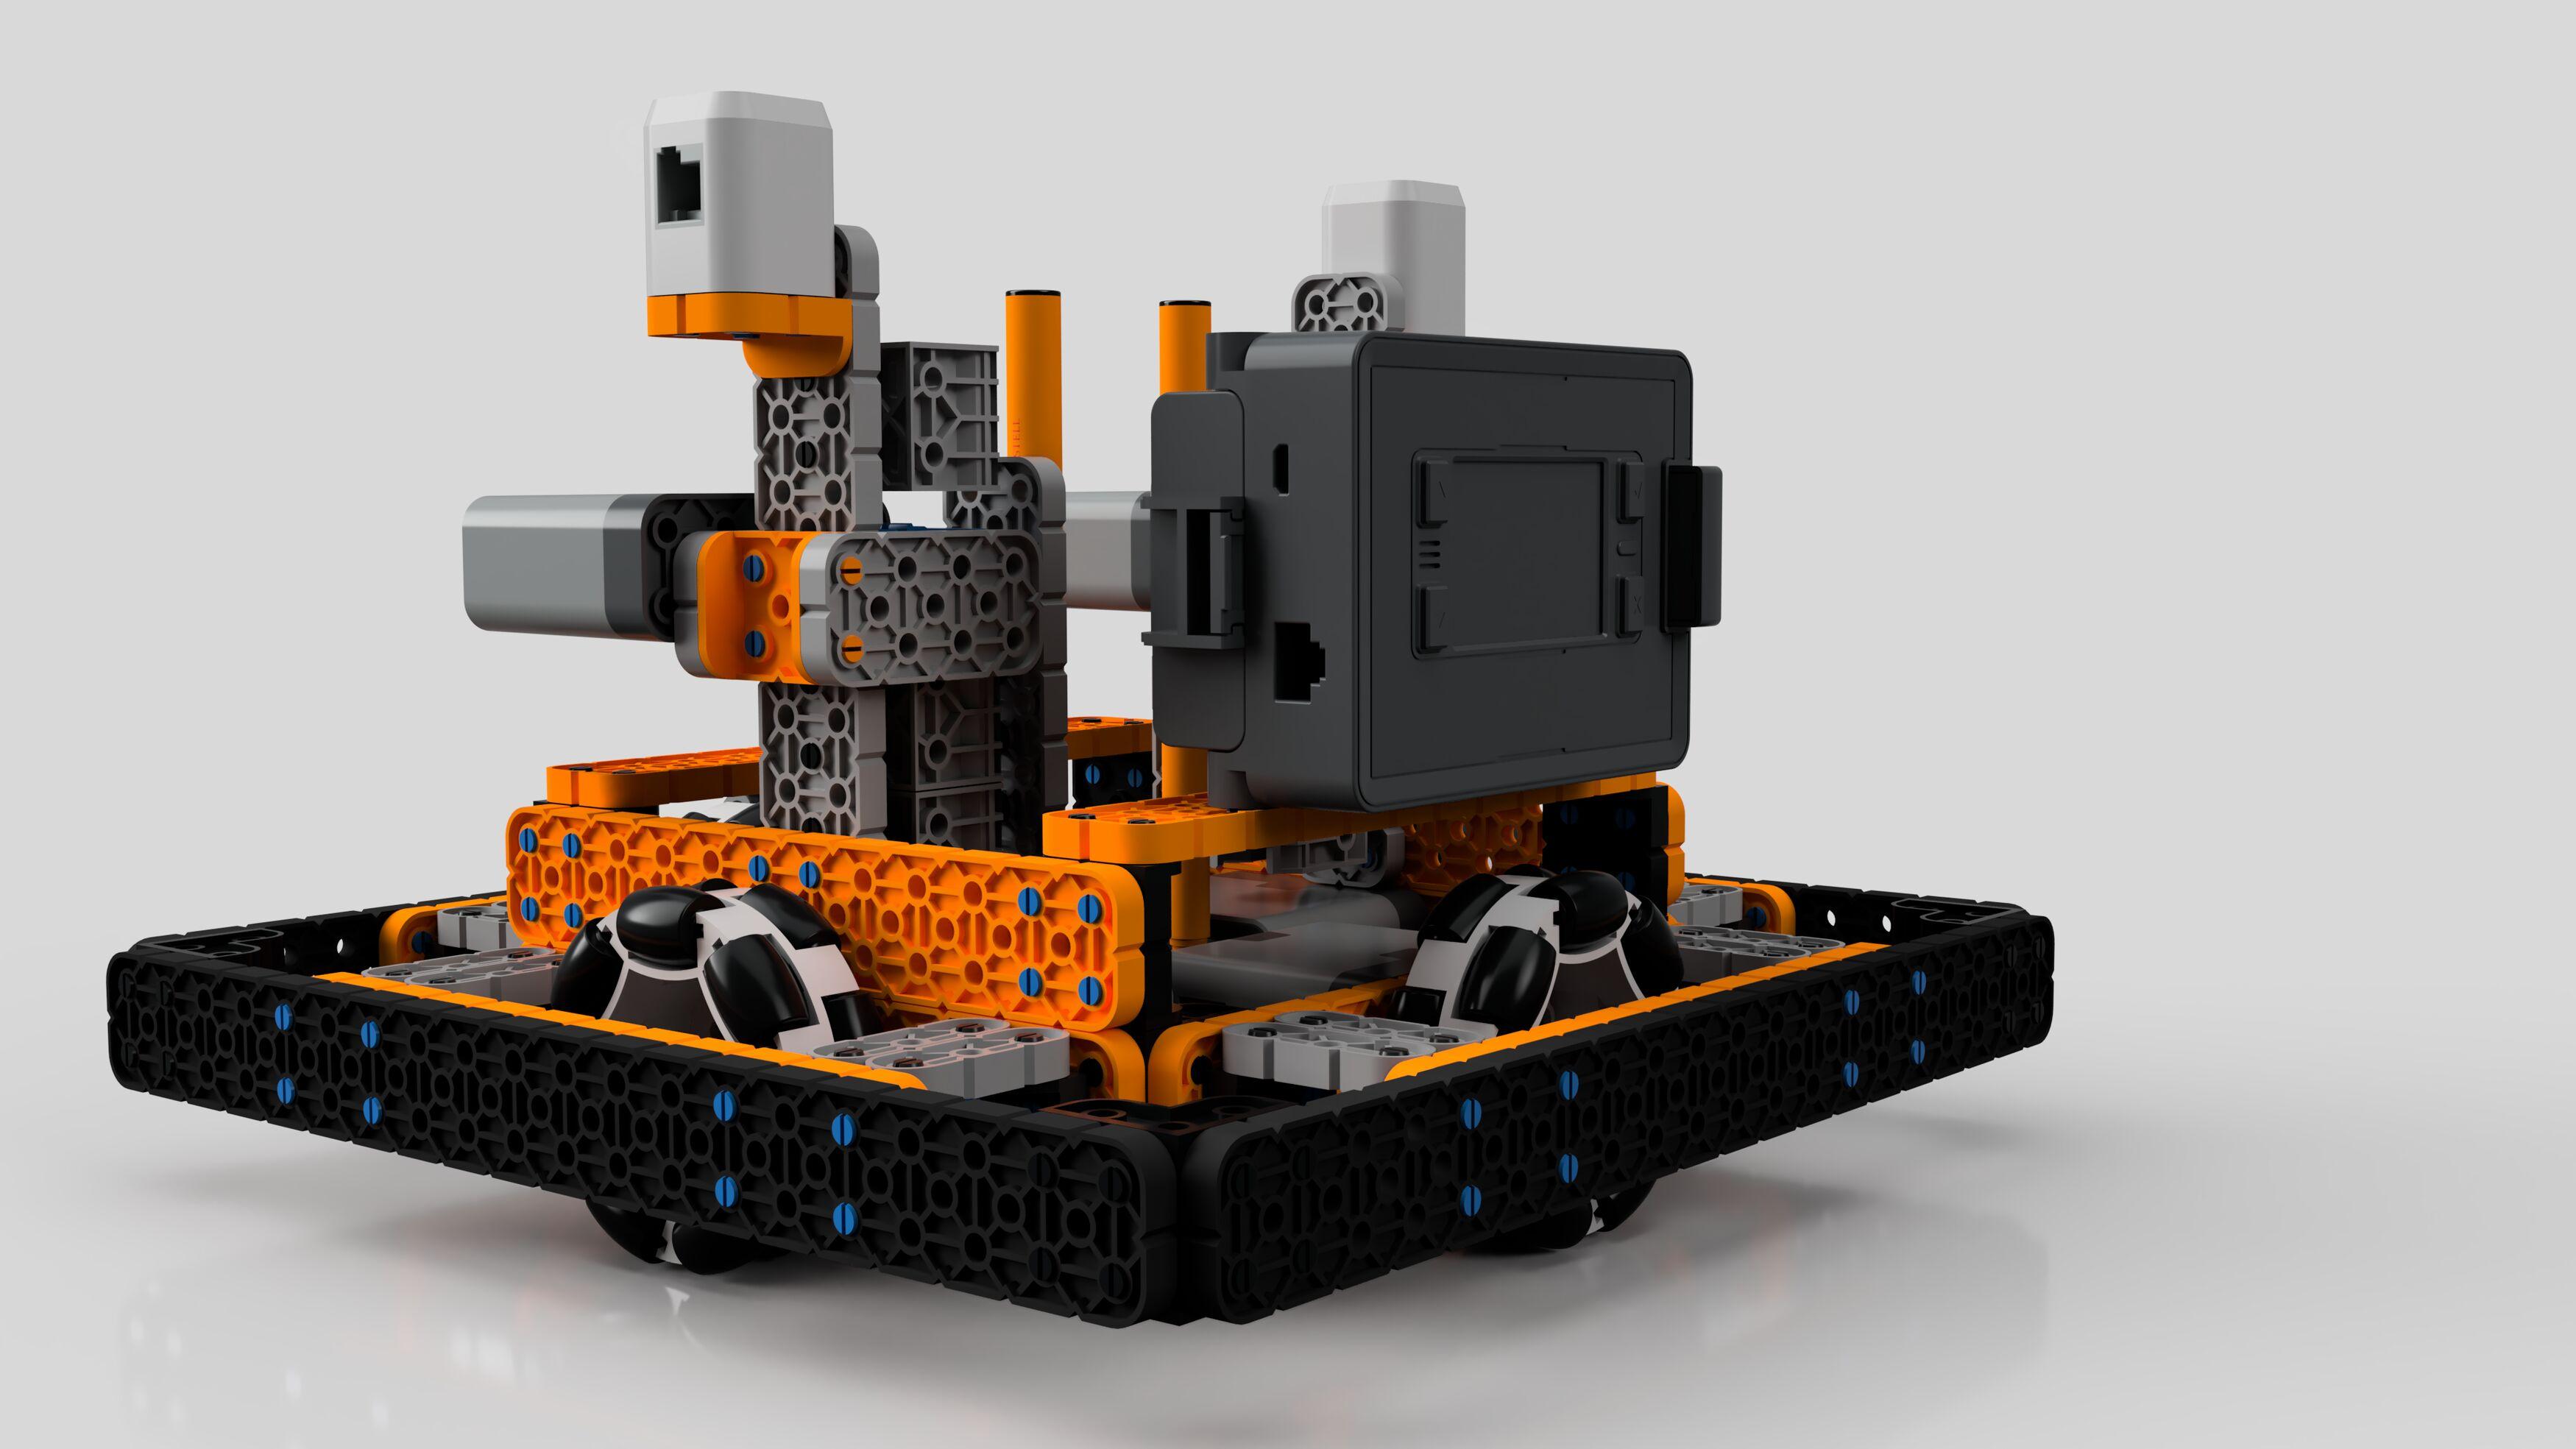 Robotics-pen-oficial-2-cores---fabrica-de-nerdes-2020-may-28-08-05-06pm-000-customizedview8023379805-png-3500-3500